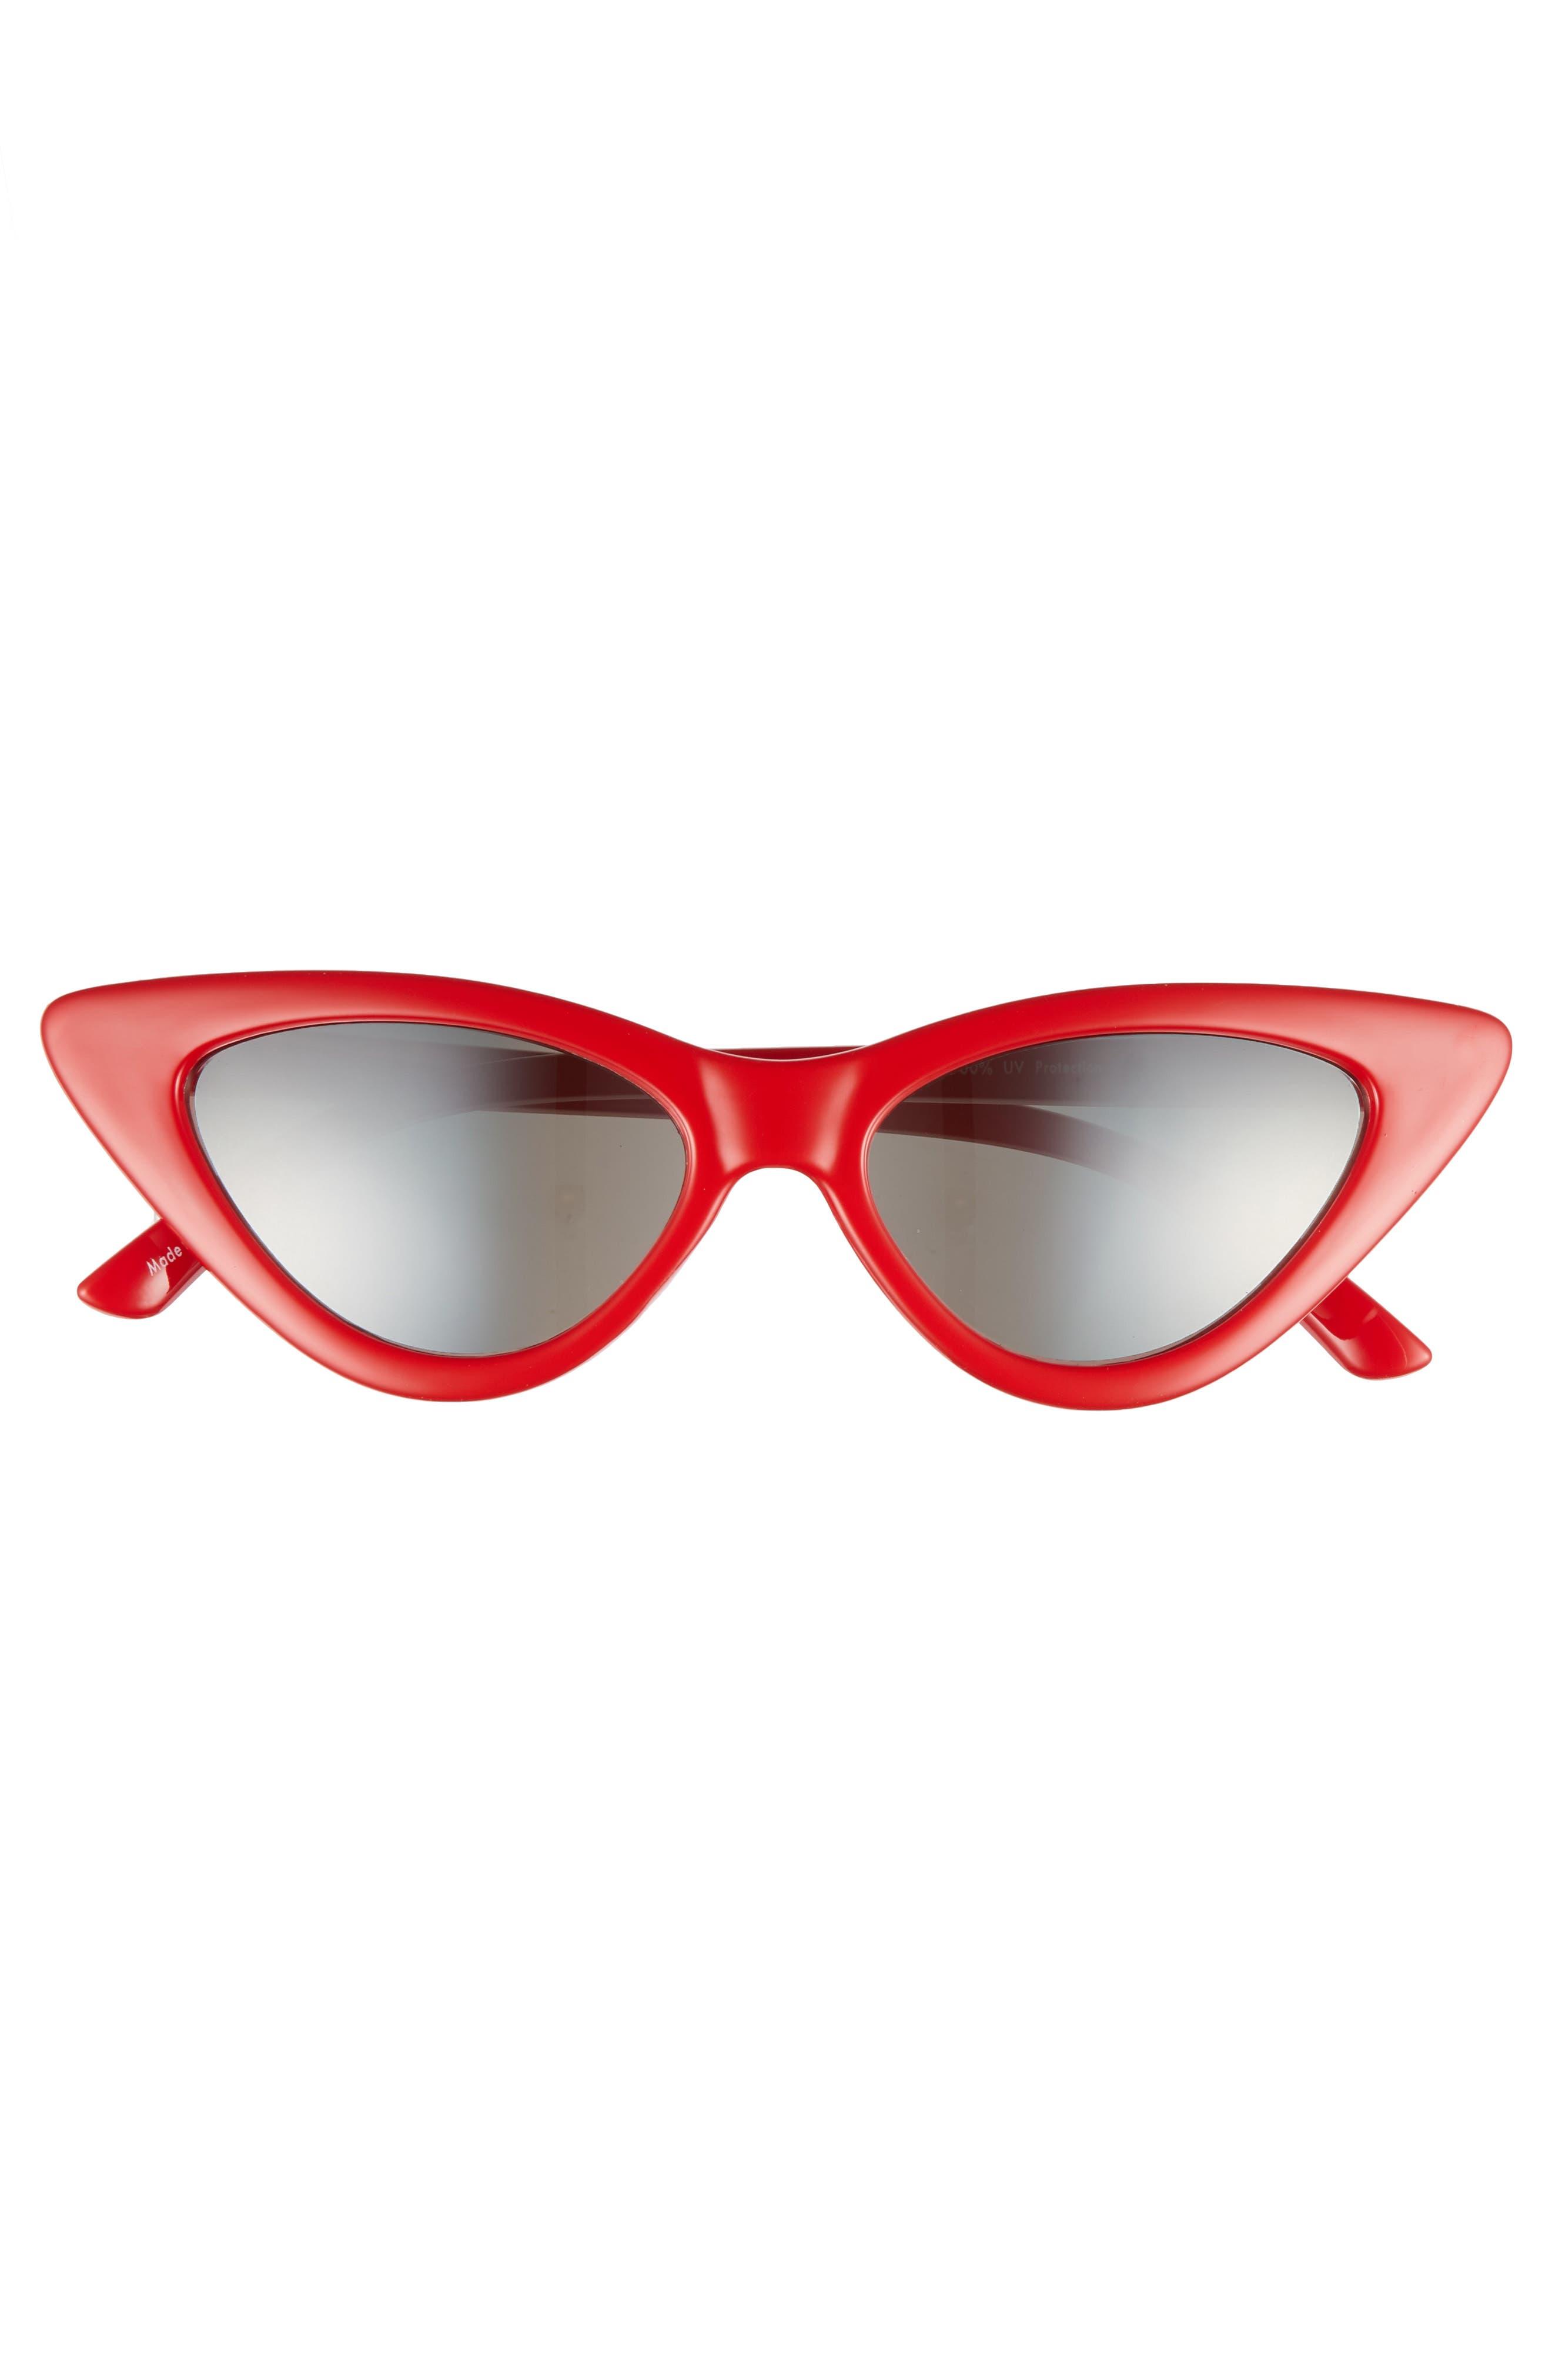 62mm Cat Eye Sunglasses,                             Alternate thumbnail 8, color,